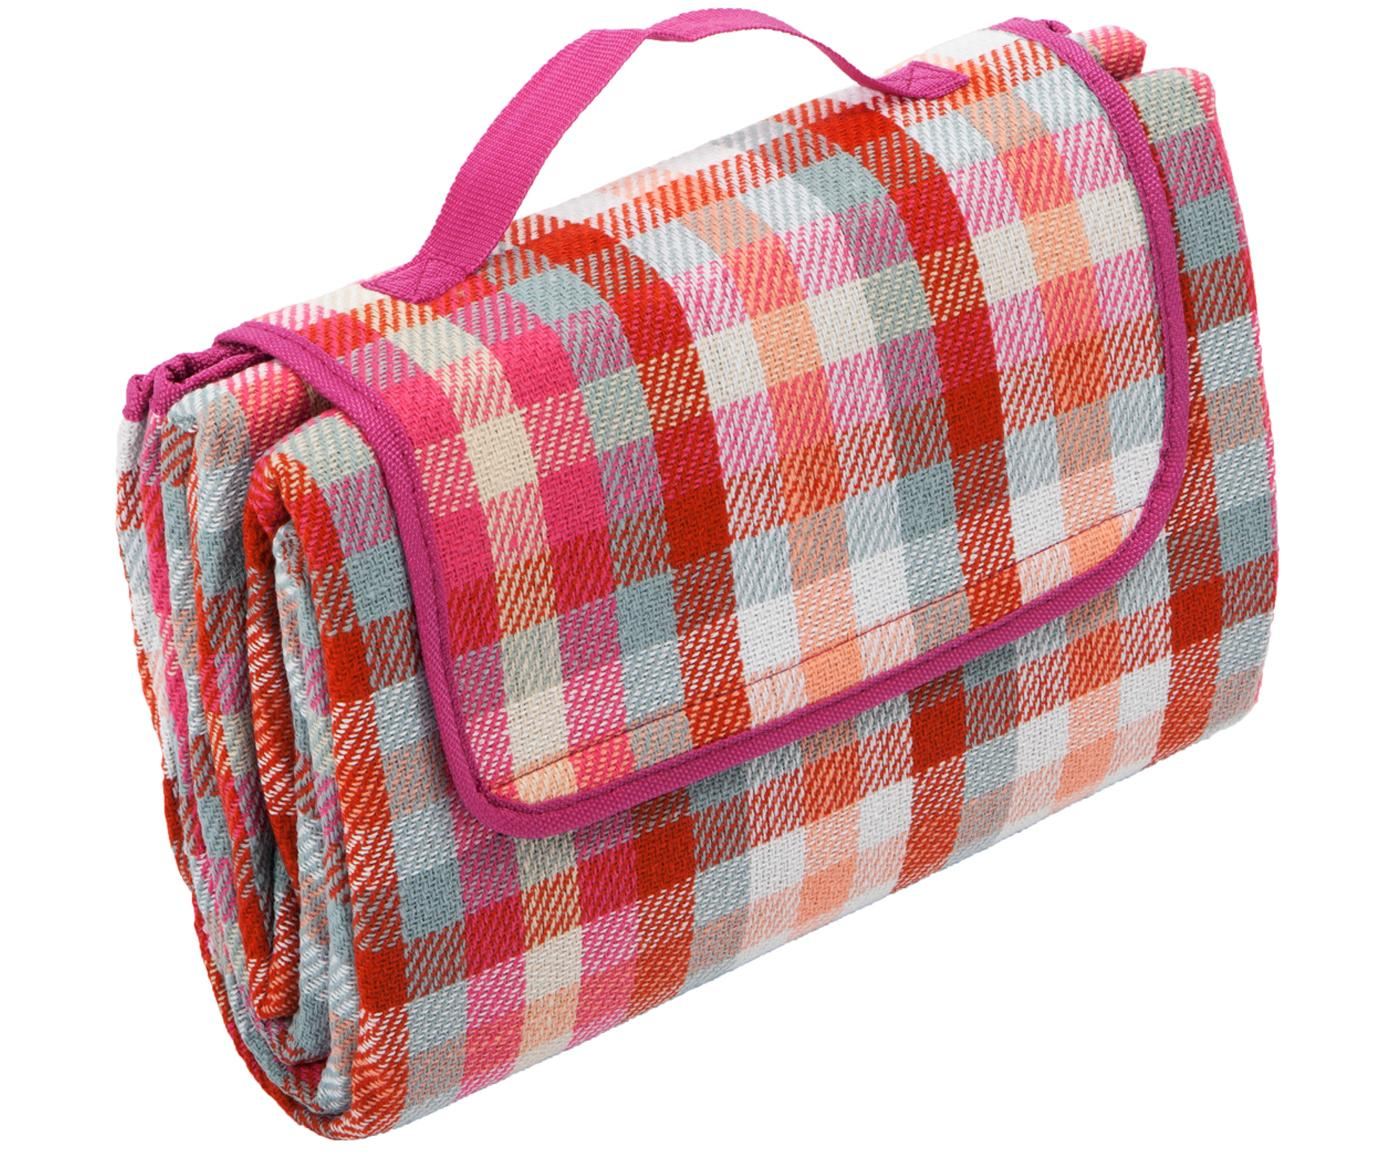 Manta de picnic Clear, Parte superior: fibra sintética, Parte trasera: plástico, Rojo, blanco, rosa, menta, melocotón, An 130 x L 170 cm